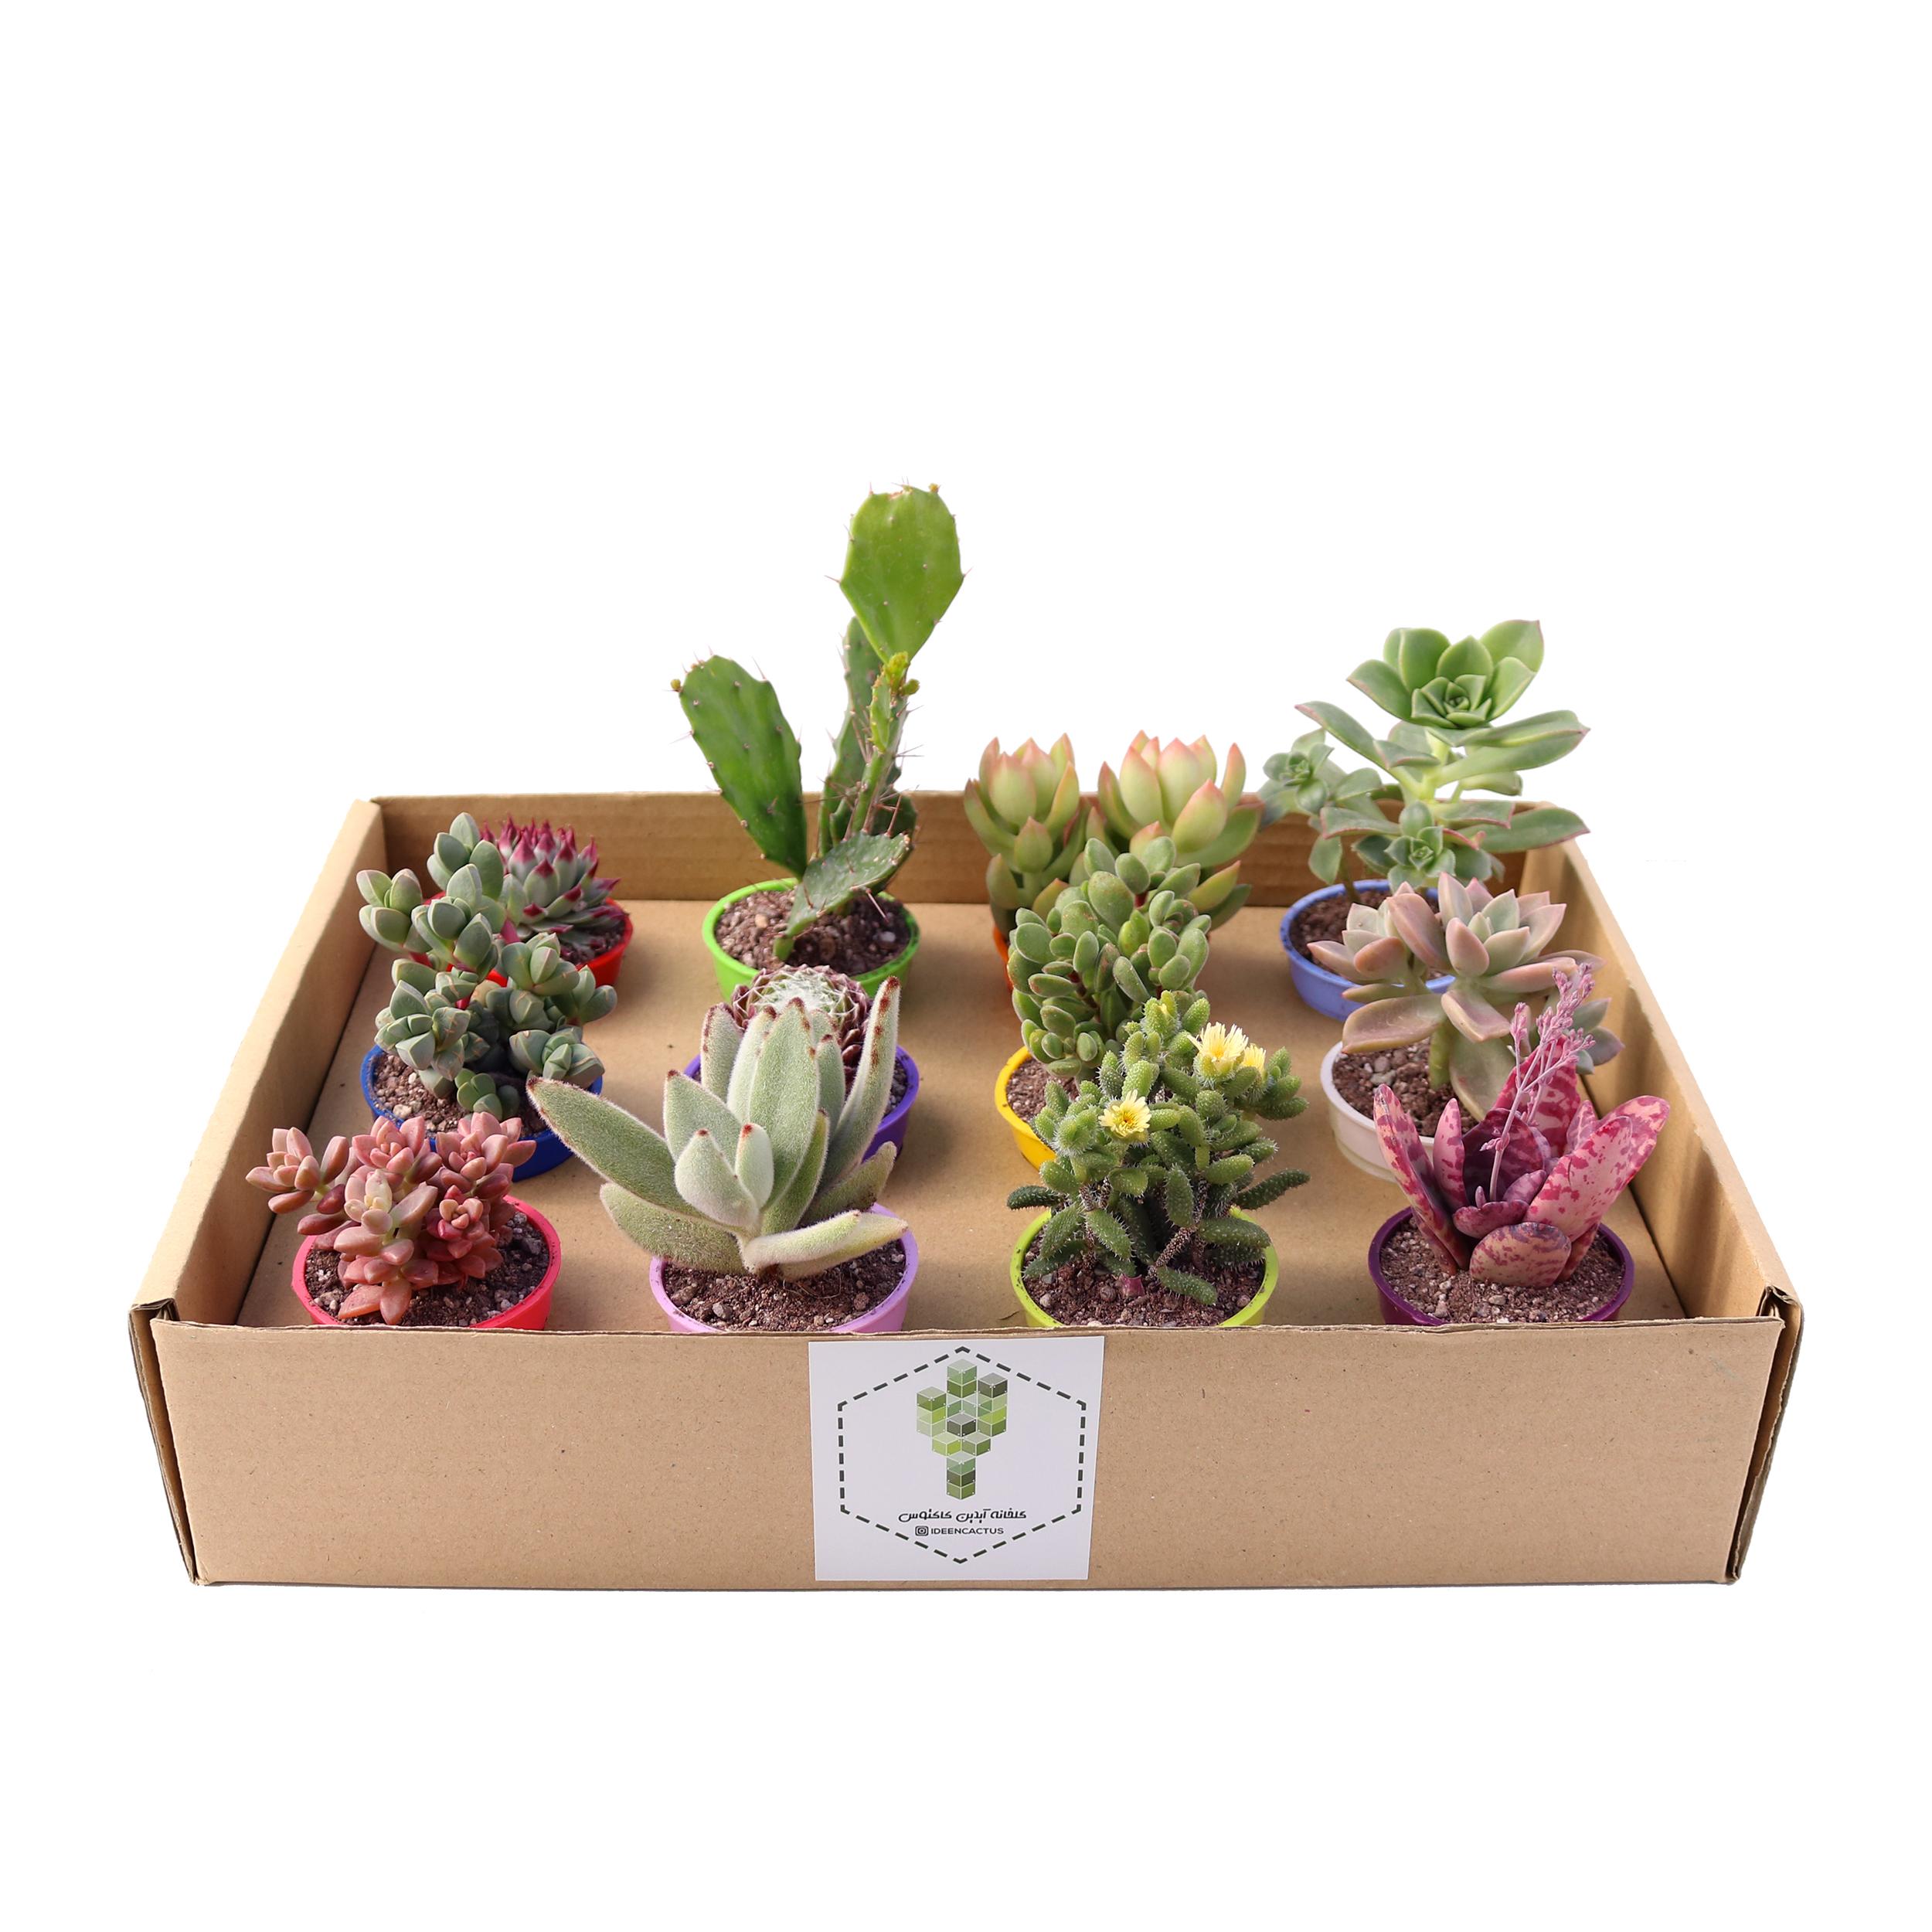 گیاه طبیعی کاکتوس و ساکولنت آیدین کاکتوس کد CB-004 بسته 12 عددی thumb 4